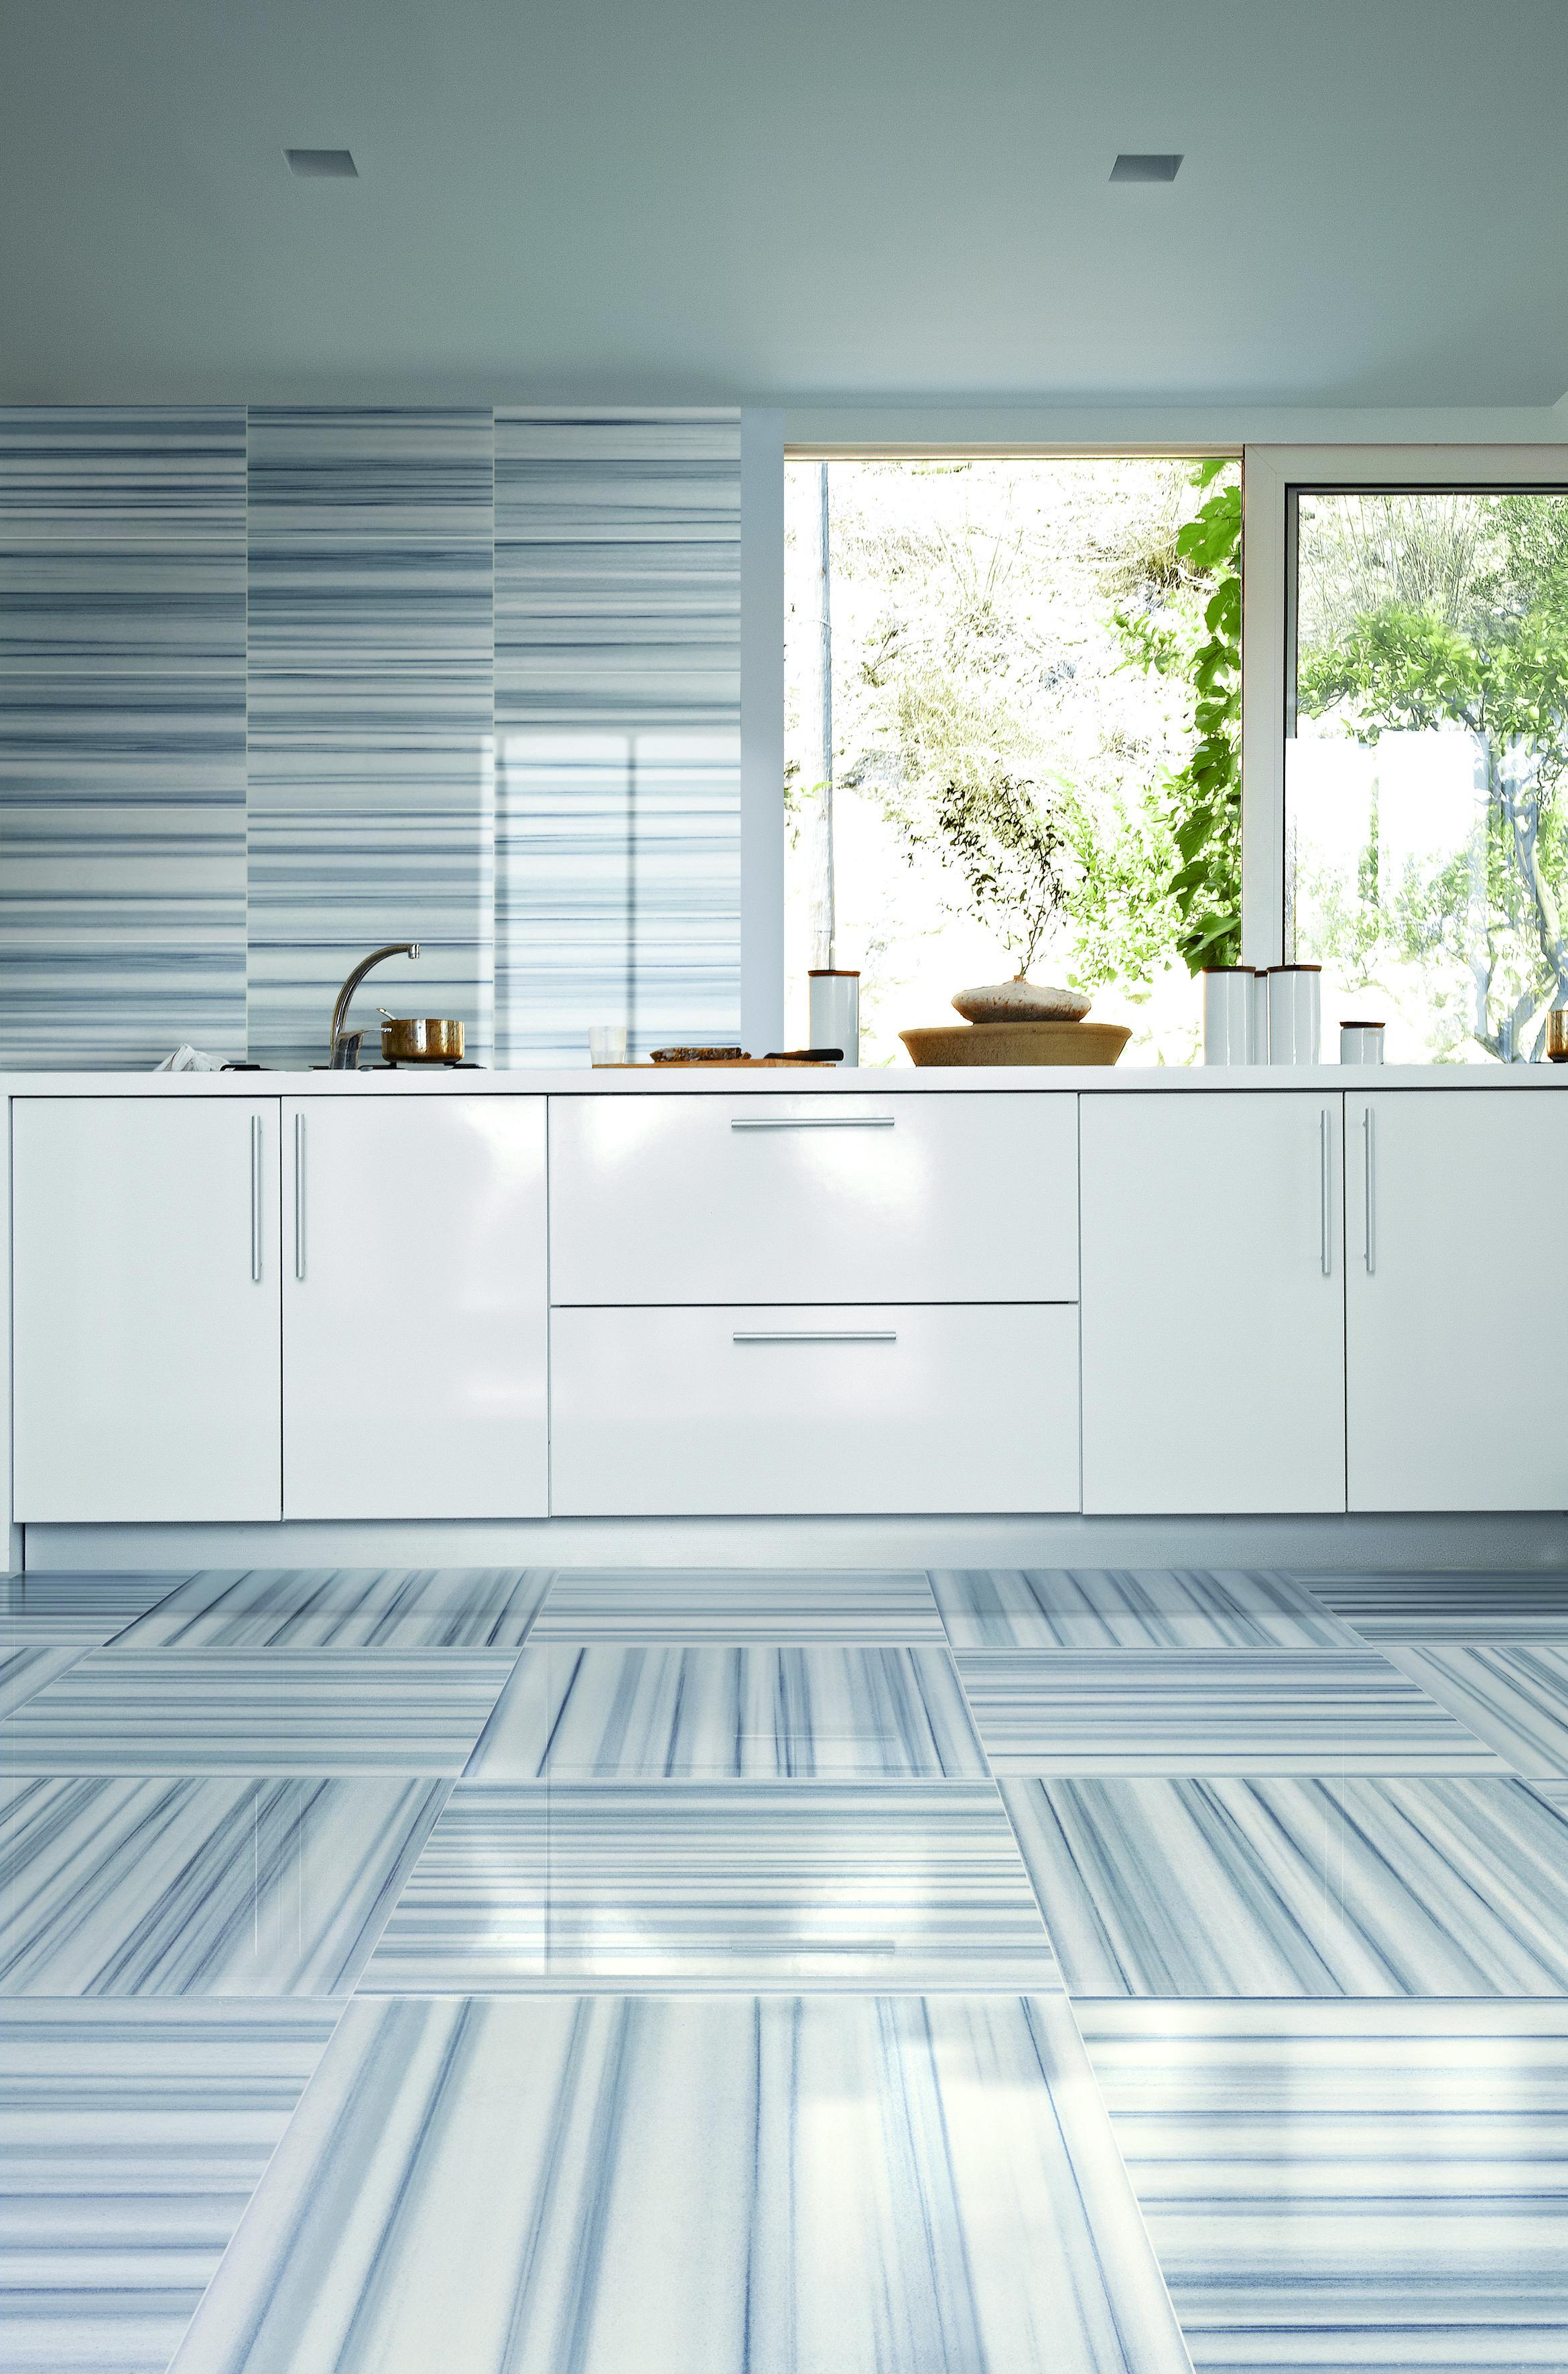 Re-Use Marble Grigio Mercurio 590x590 | House floors | Pinterest ...